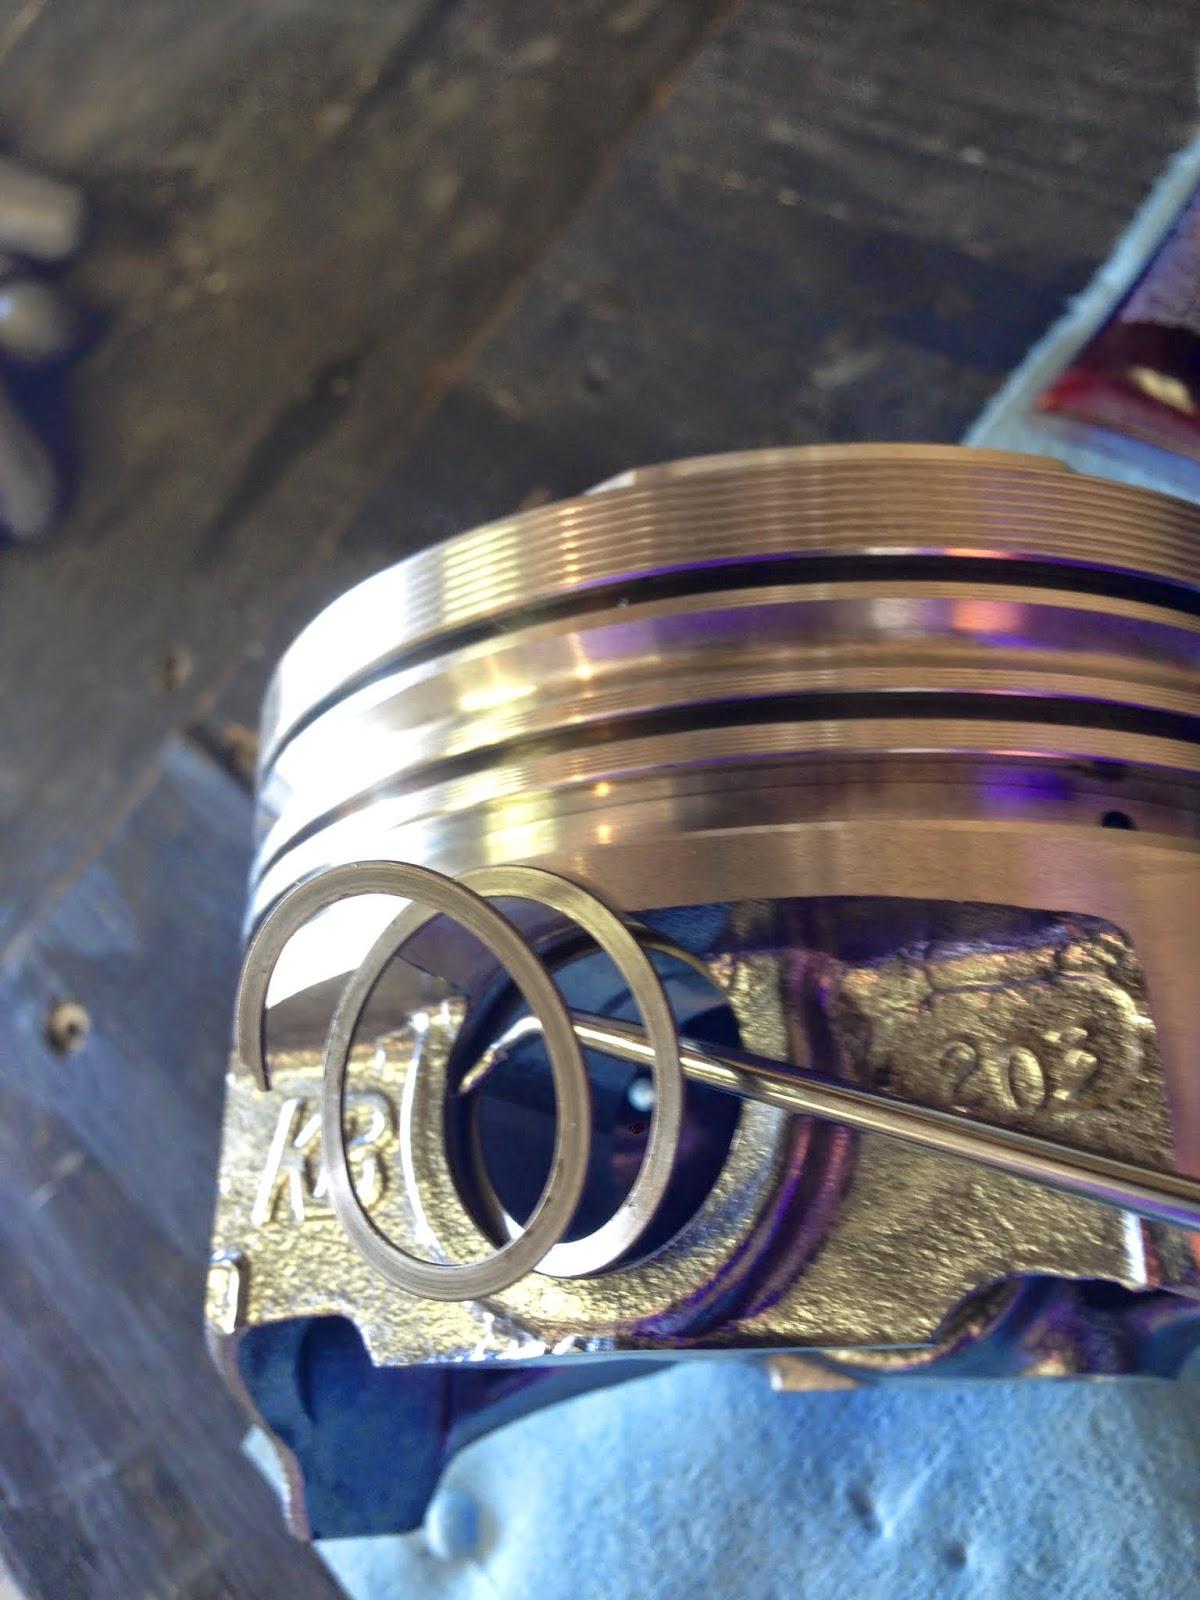 67 Malibu 454 Build: Engine Build Pre-Assembly (piston ...